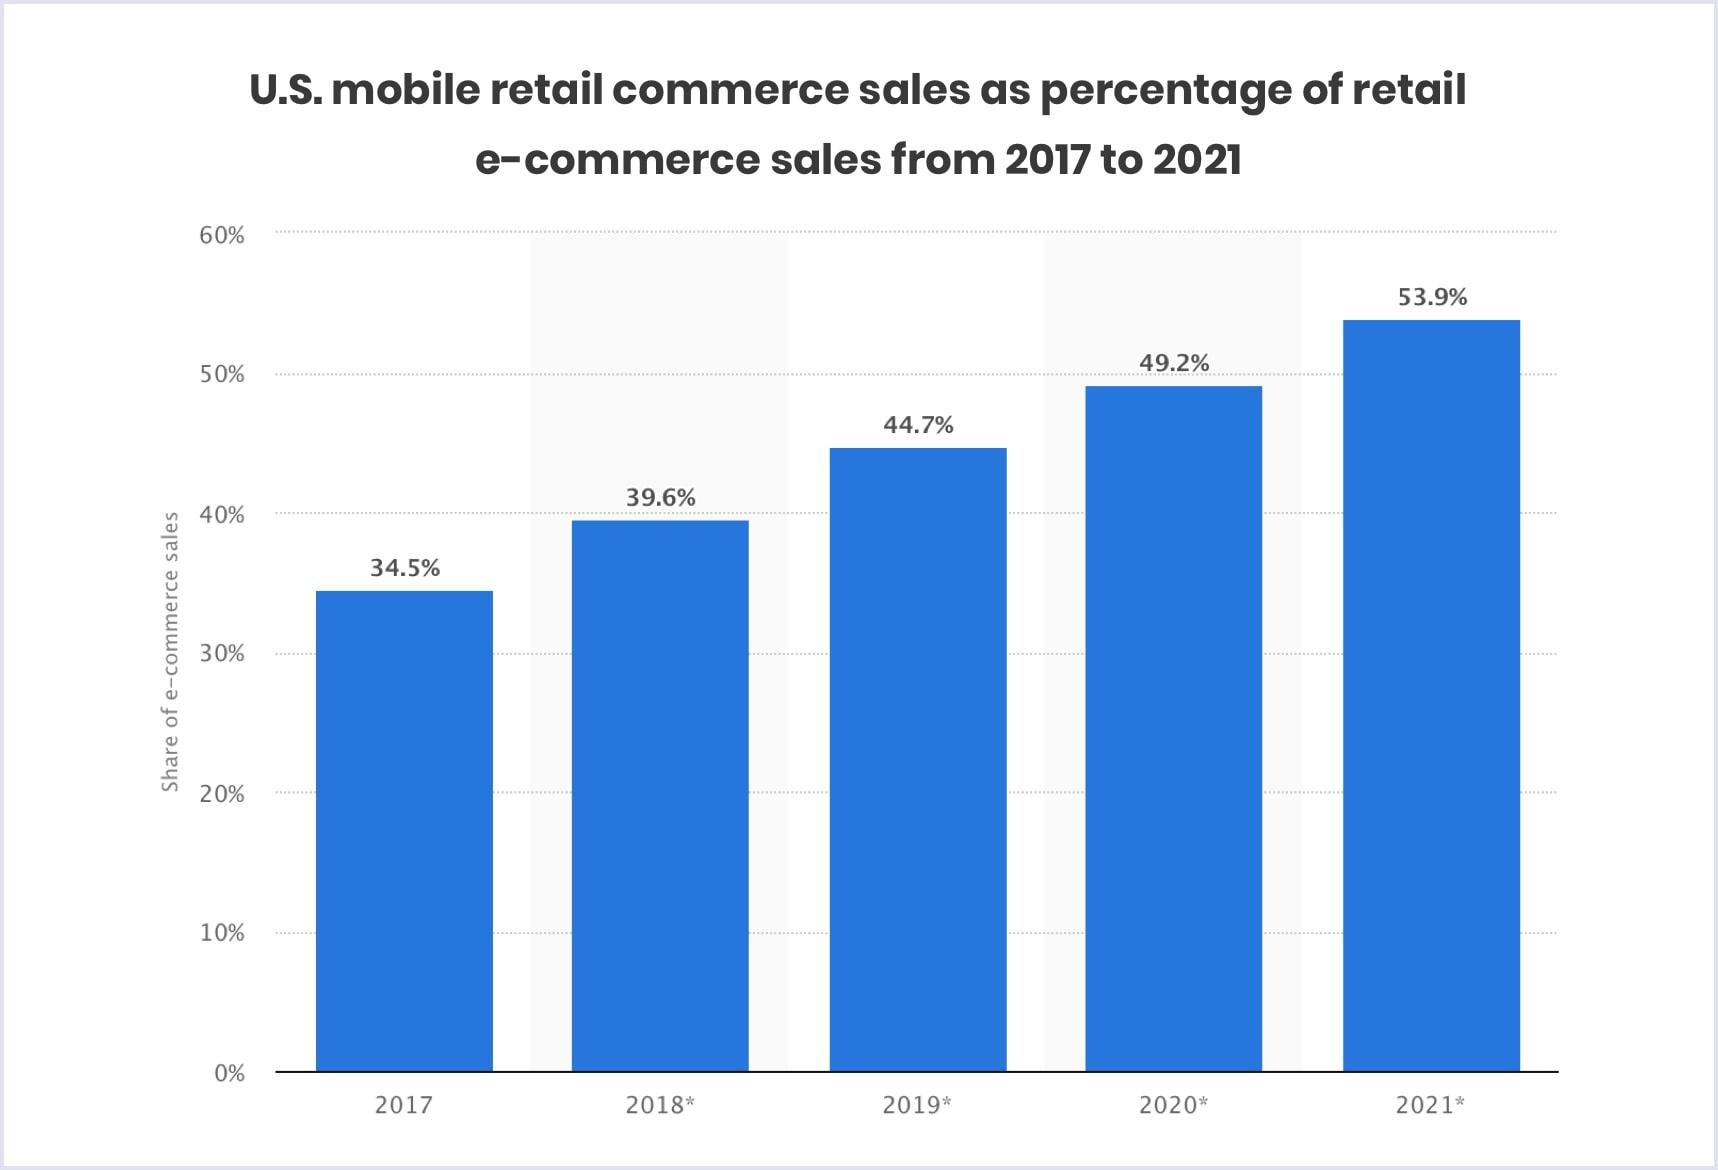 US mobile retail commerce sales as percentage of retail e-commerce sales